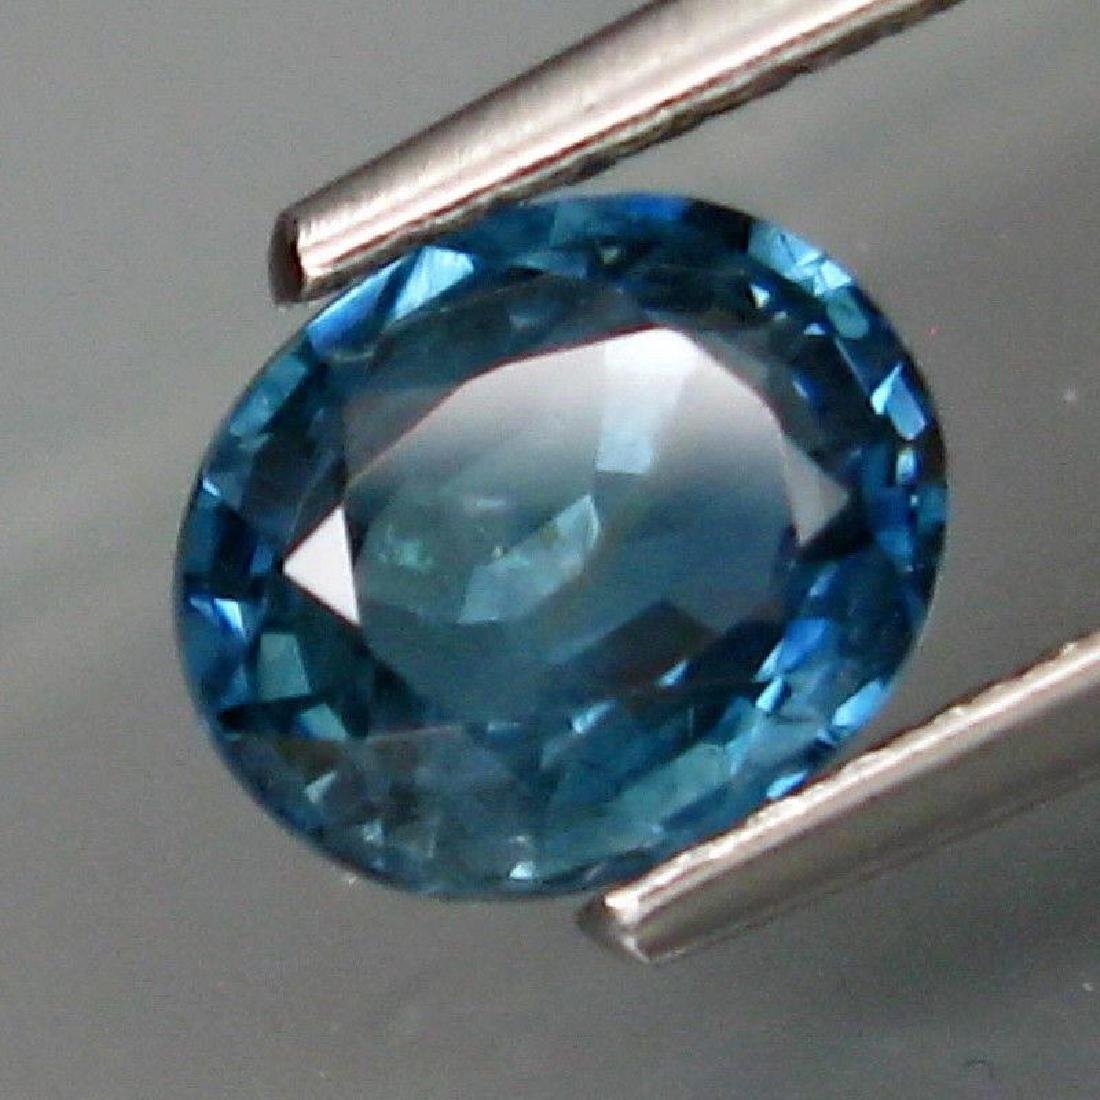 1.18 Carat Genuine Loose Sapphire